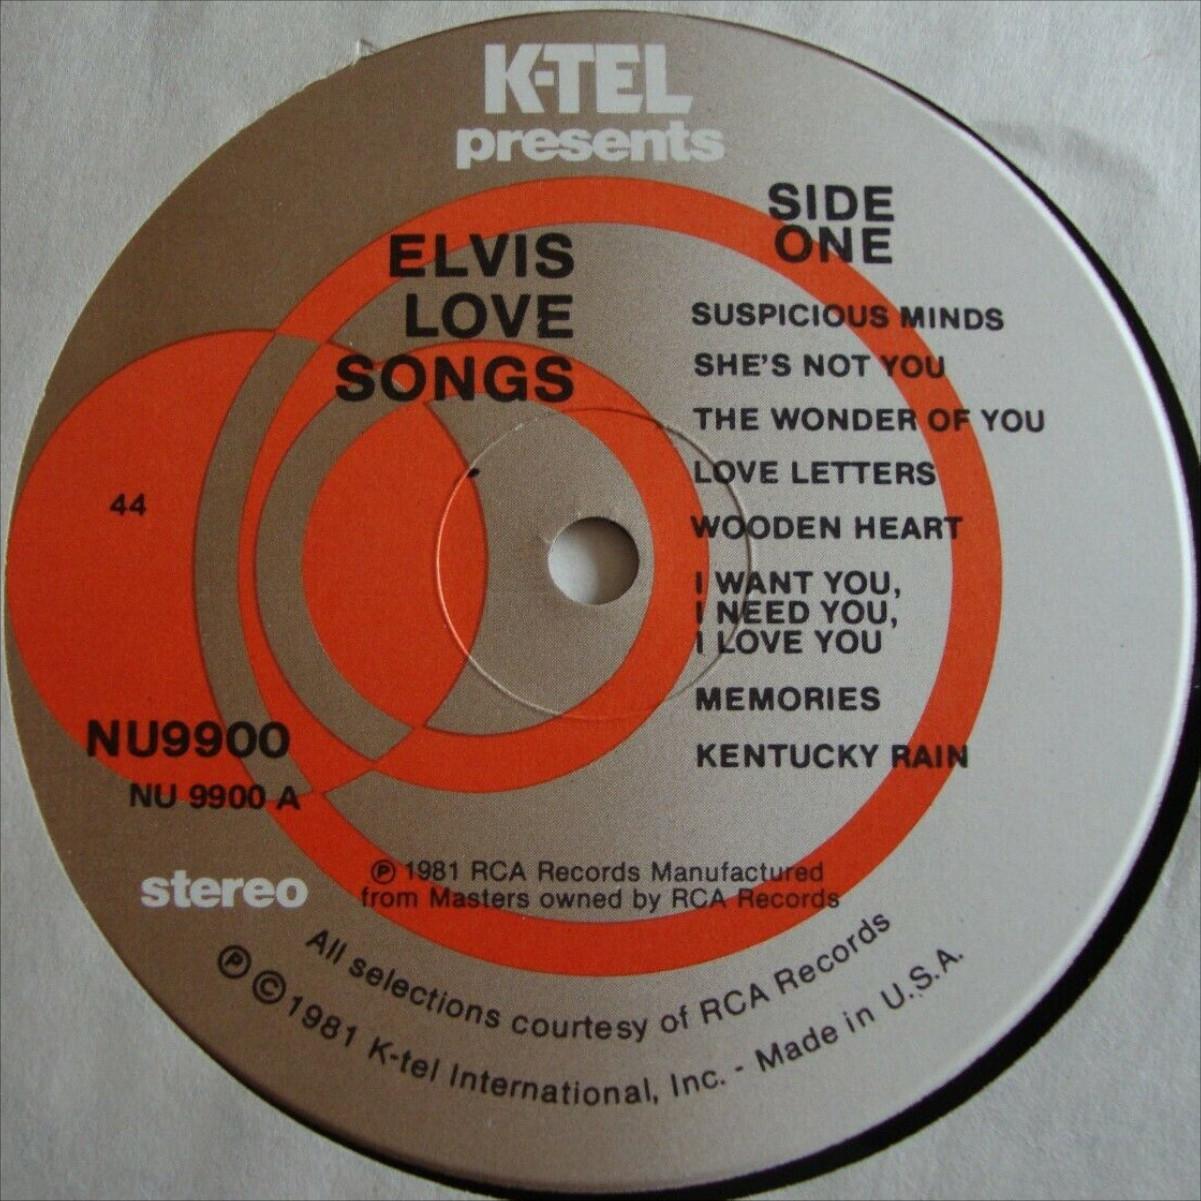 USA - ELVIS LOVE SONGS 34ukzd